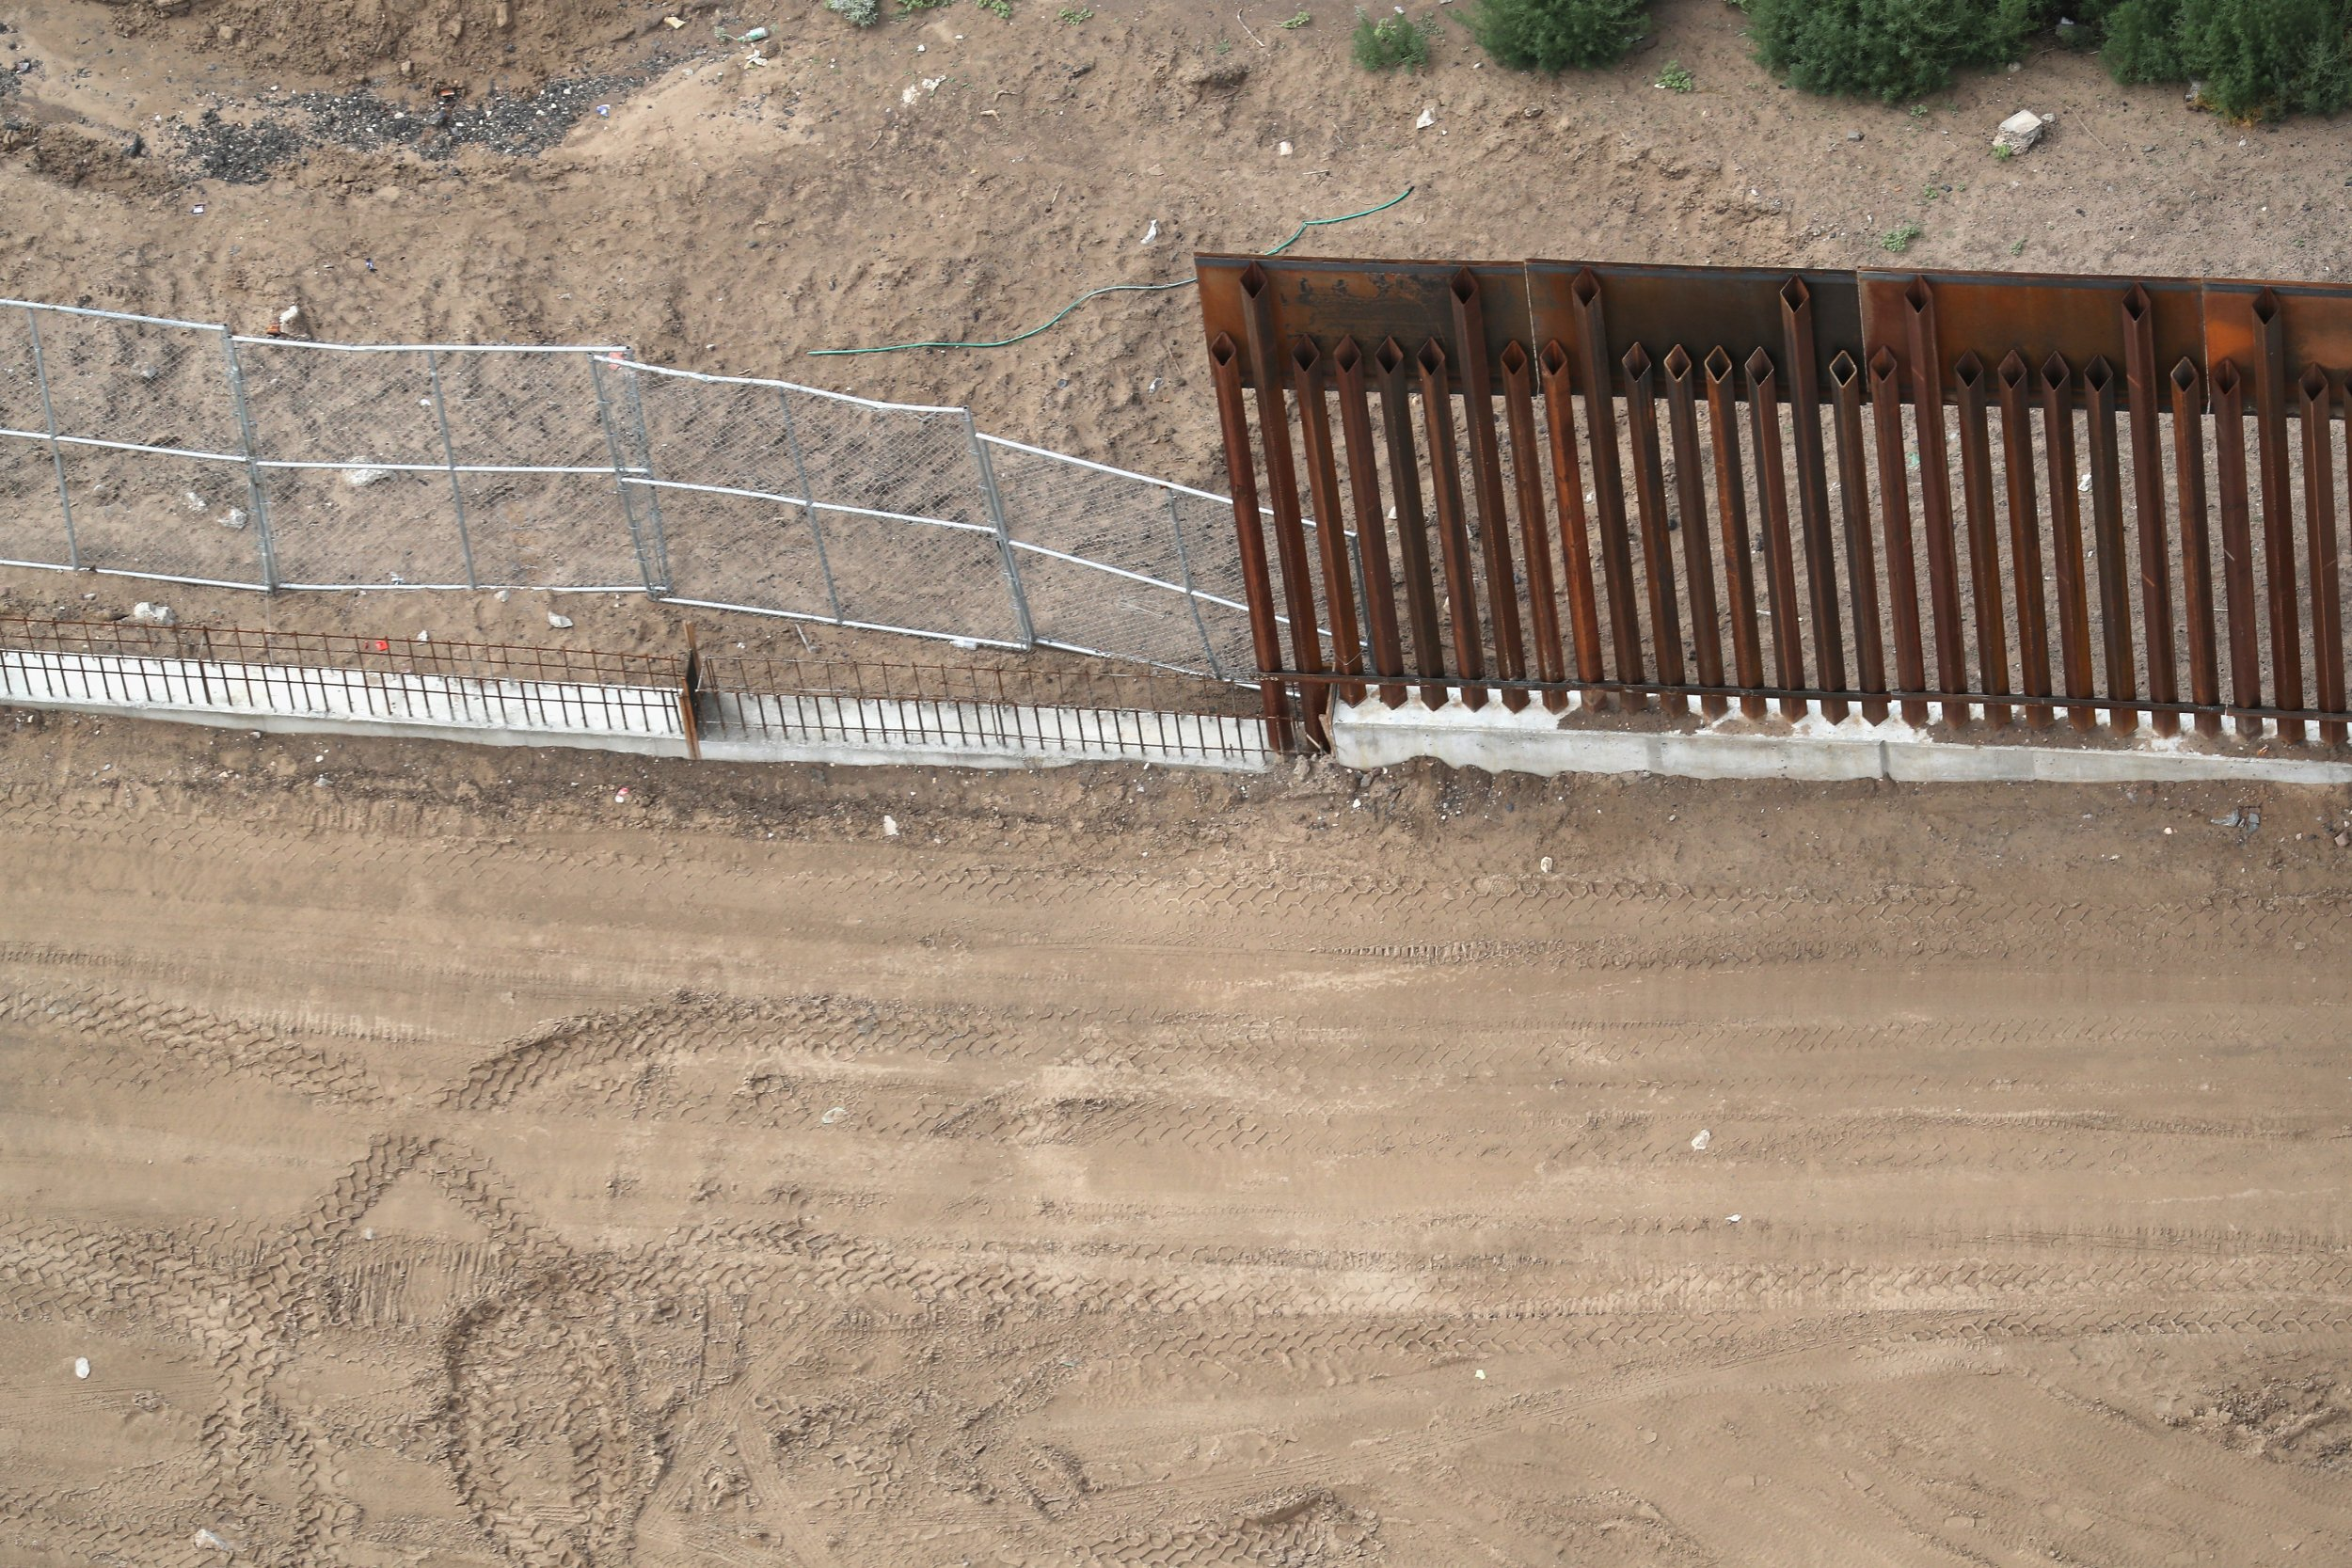 1_28-Mexico border wall